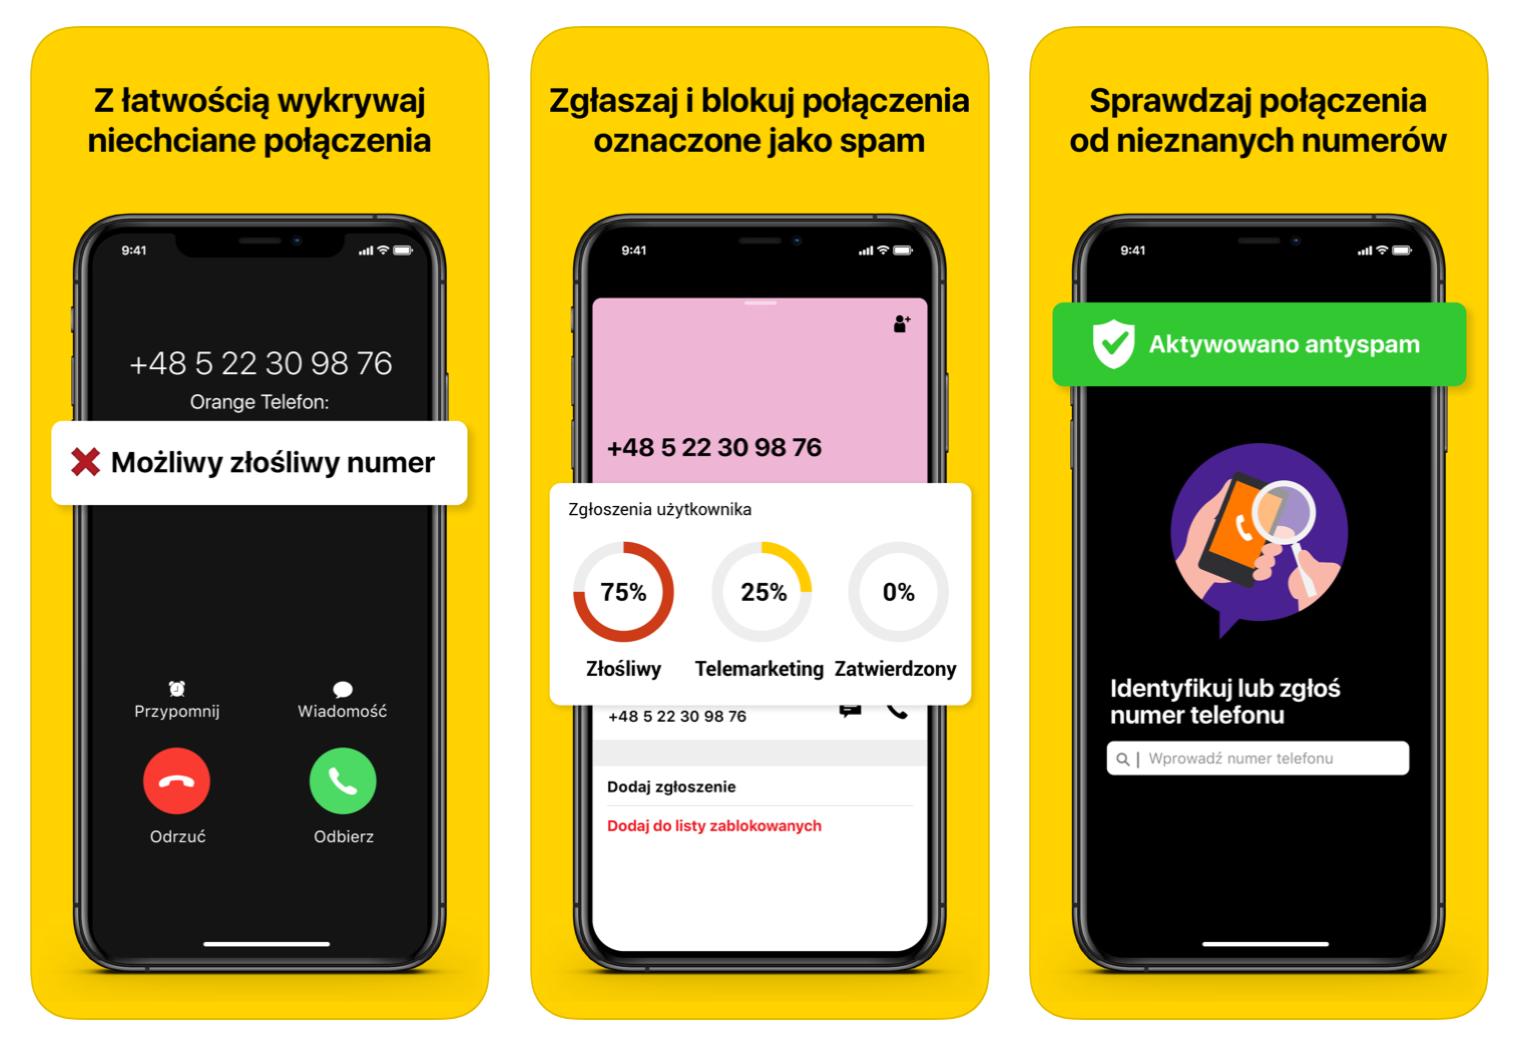 orange telefon aplikacja antyspam